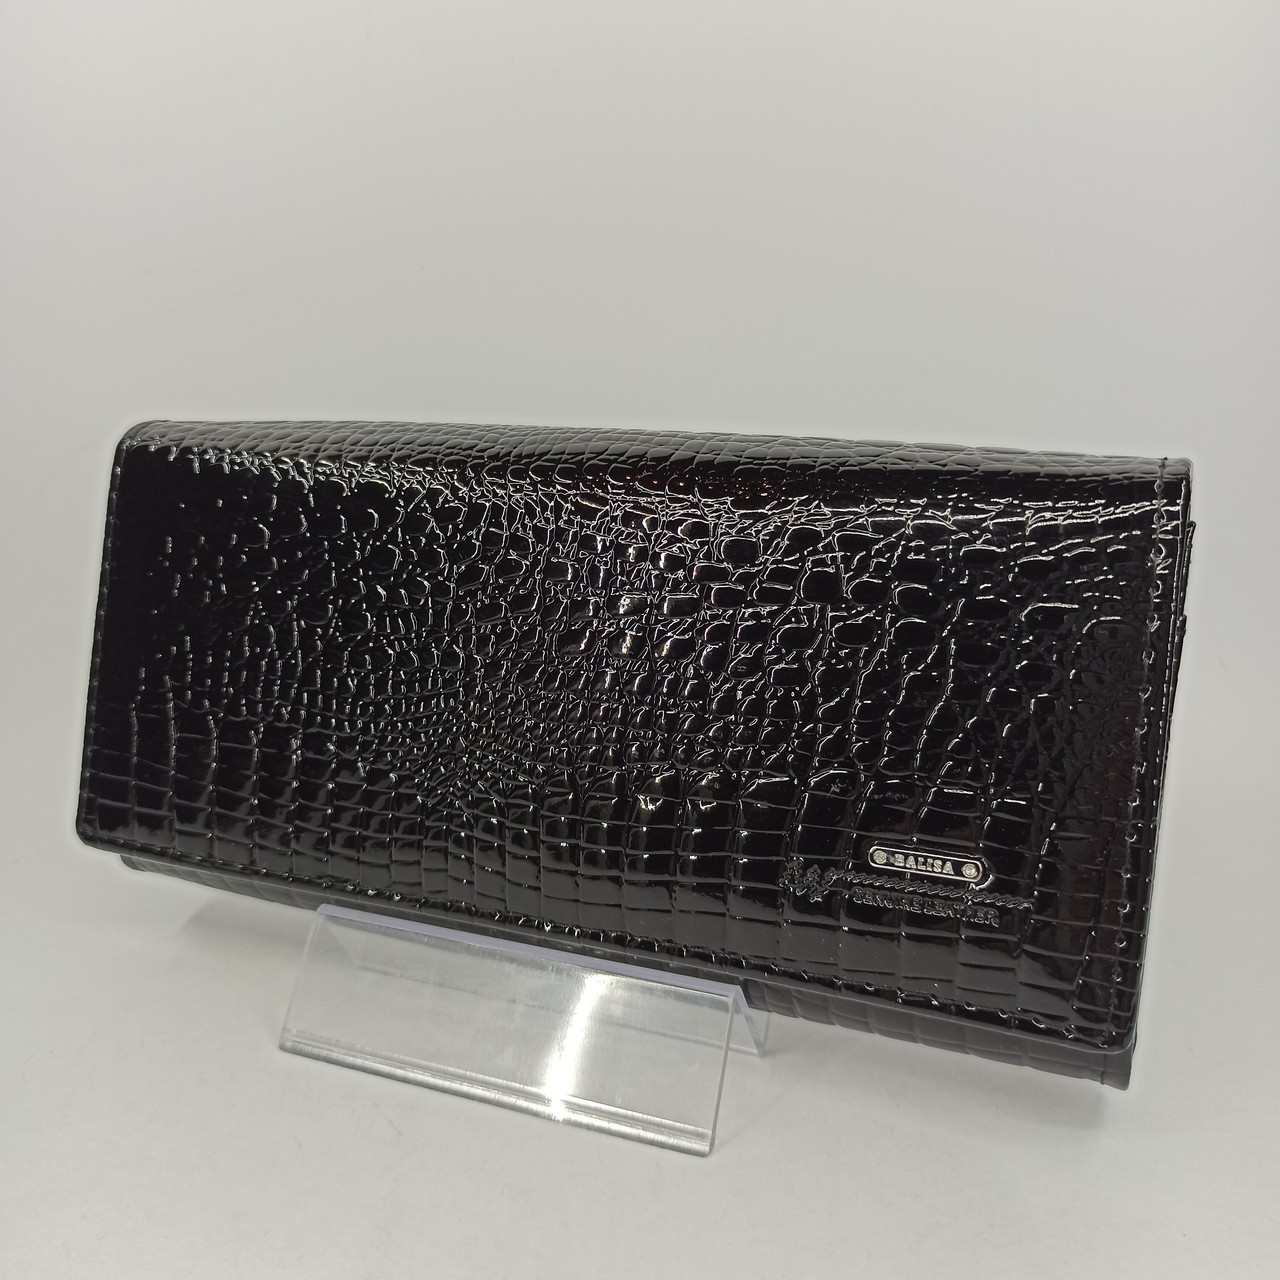 Класичний шкіряний жіночий гаманець / Классический кожаный женский кошелек Balisa C826-025 black